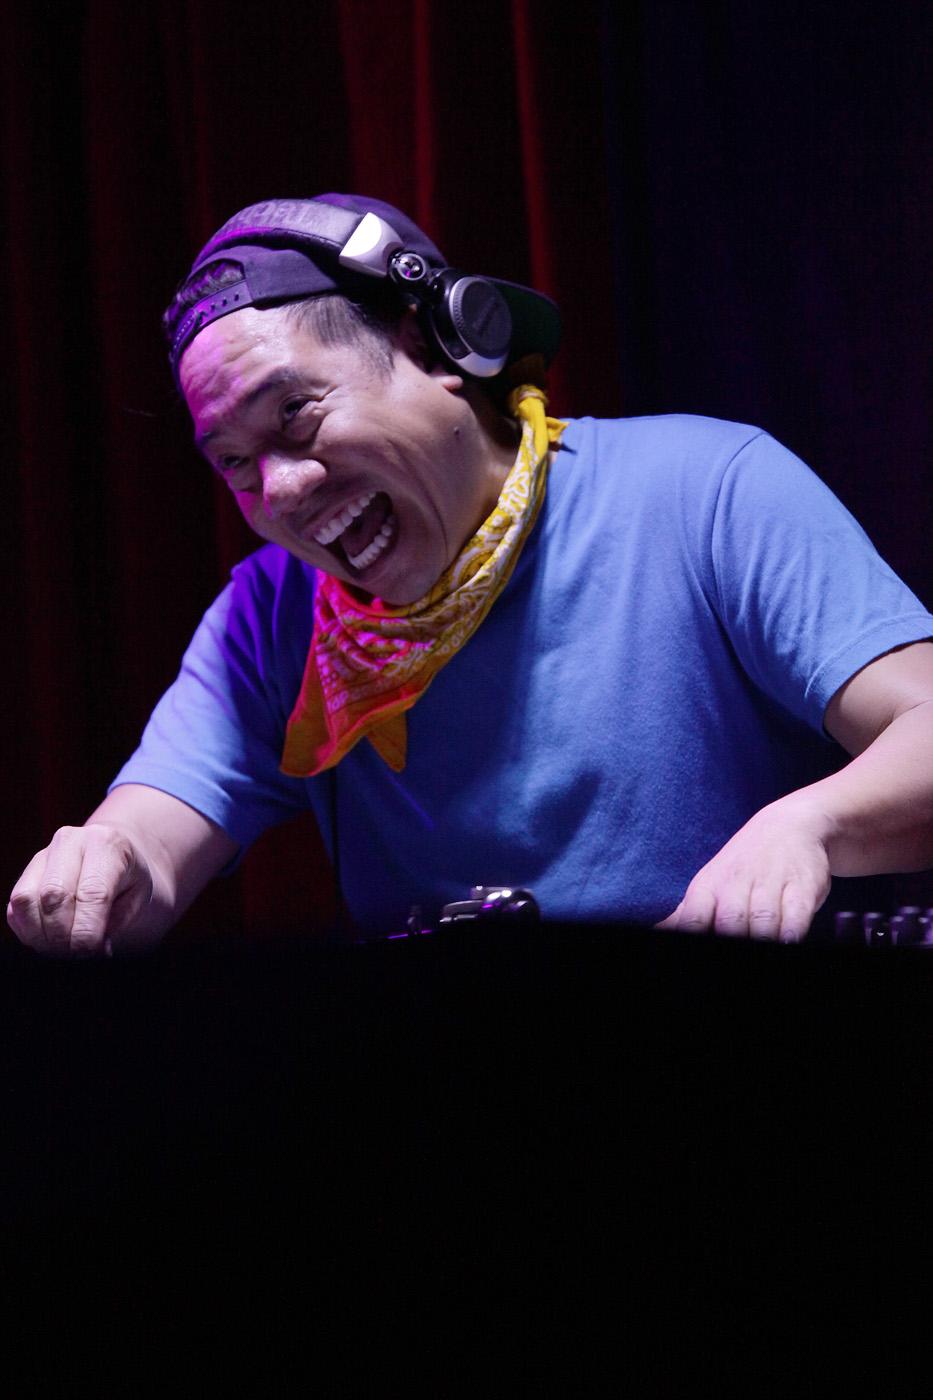 DJ Jester by Lindsay Hagblom